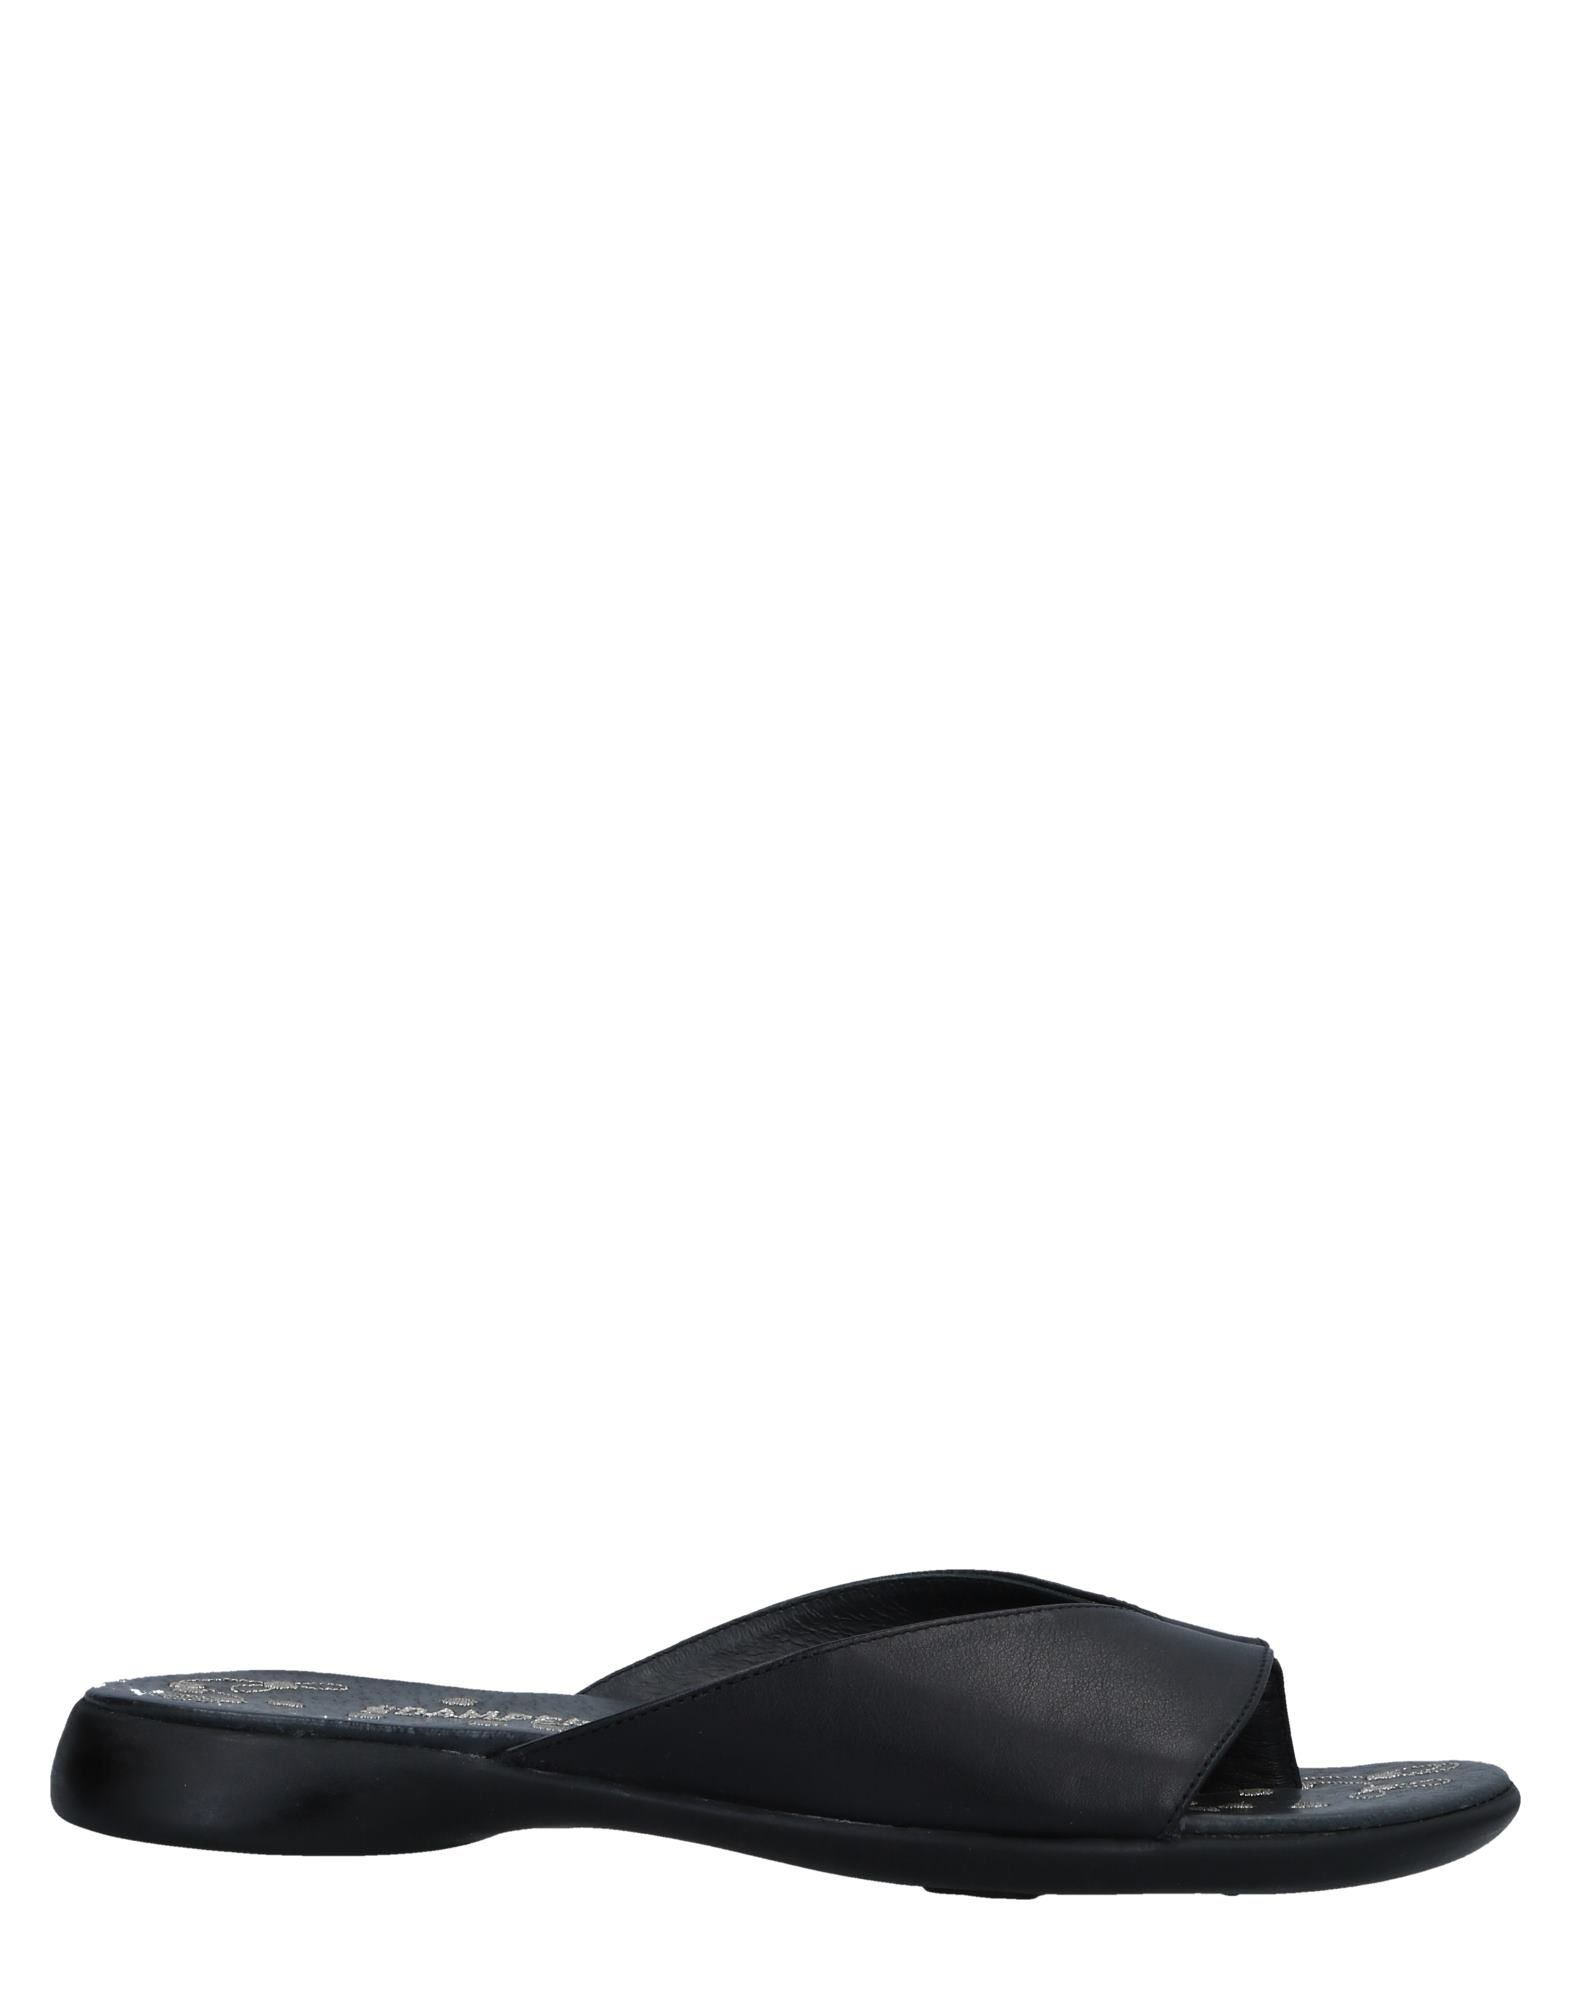 Camper Gute Dianetten Damen  11514588WT Gute Camper Qualität beliebte Schuhe 0defa9